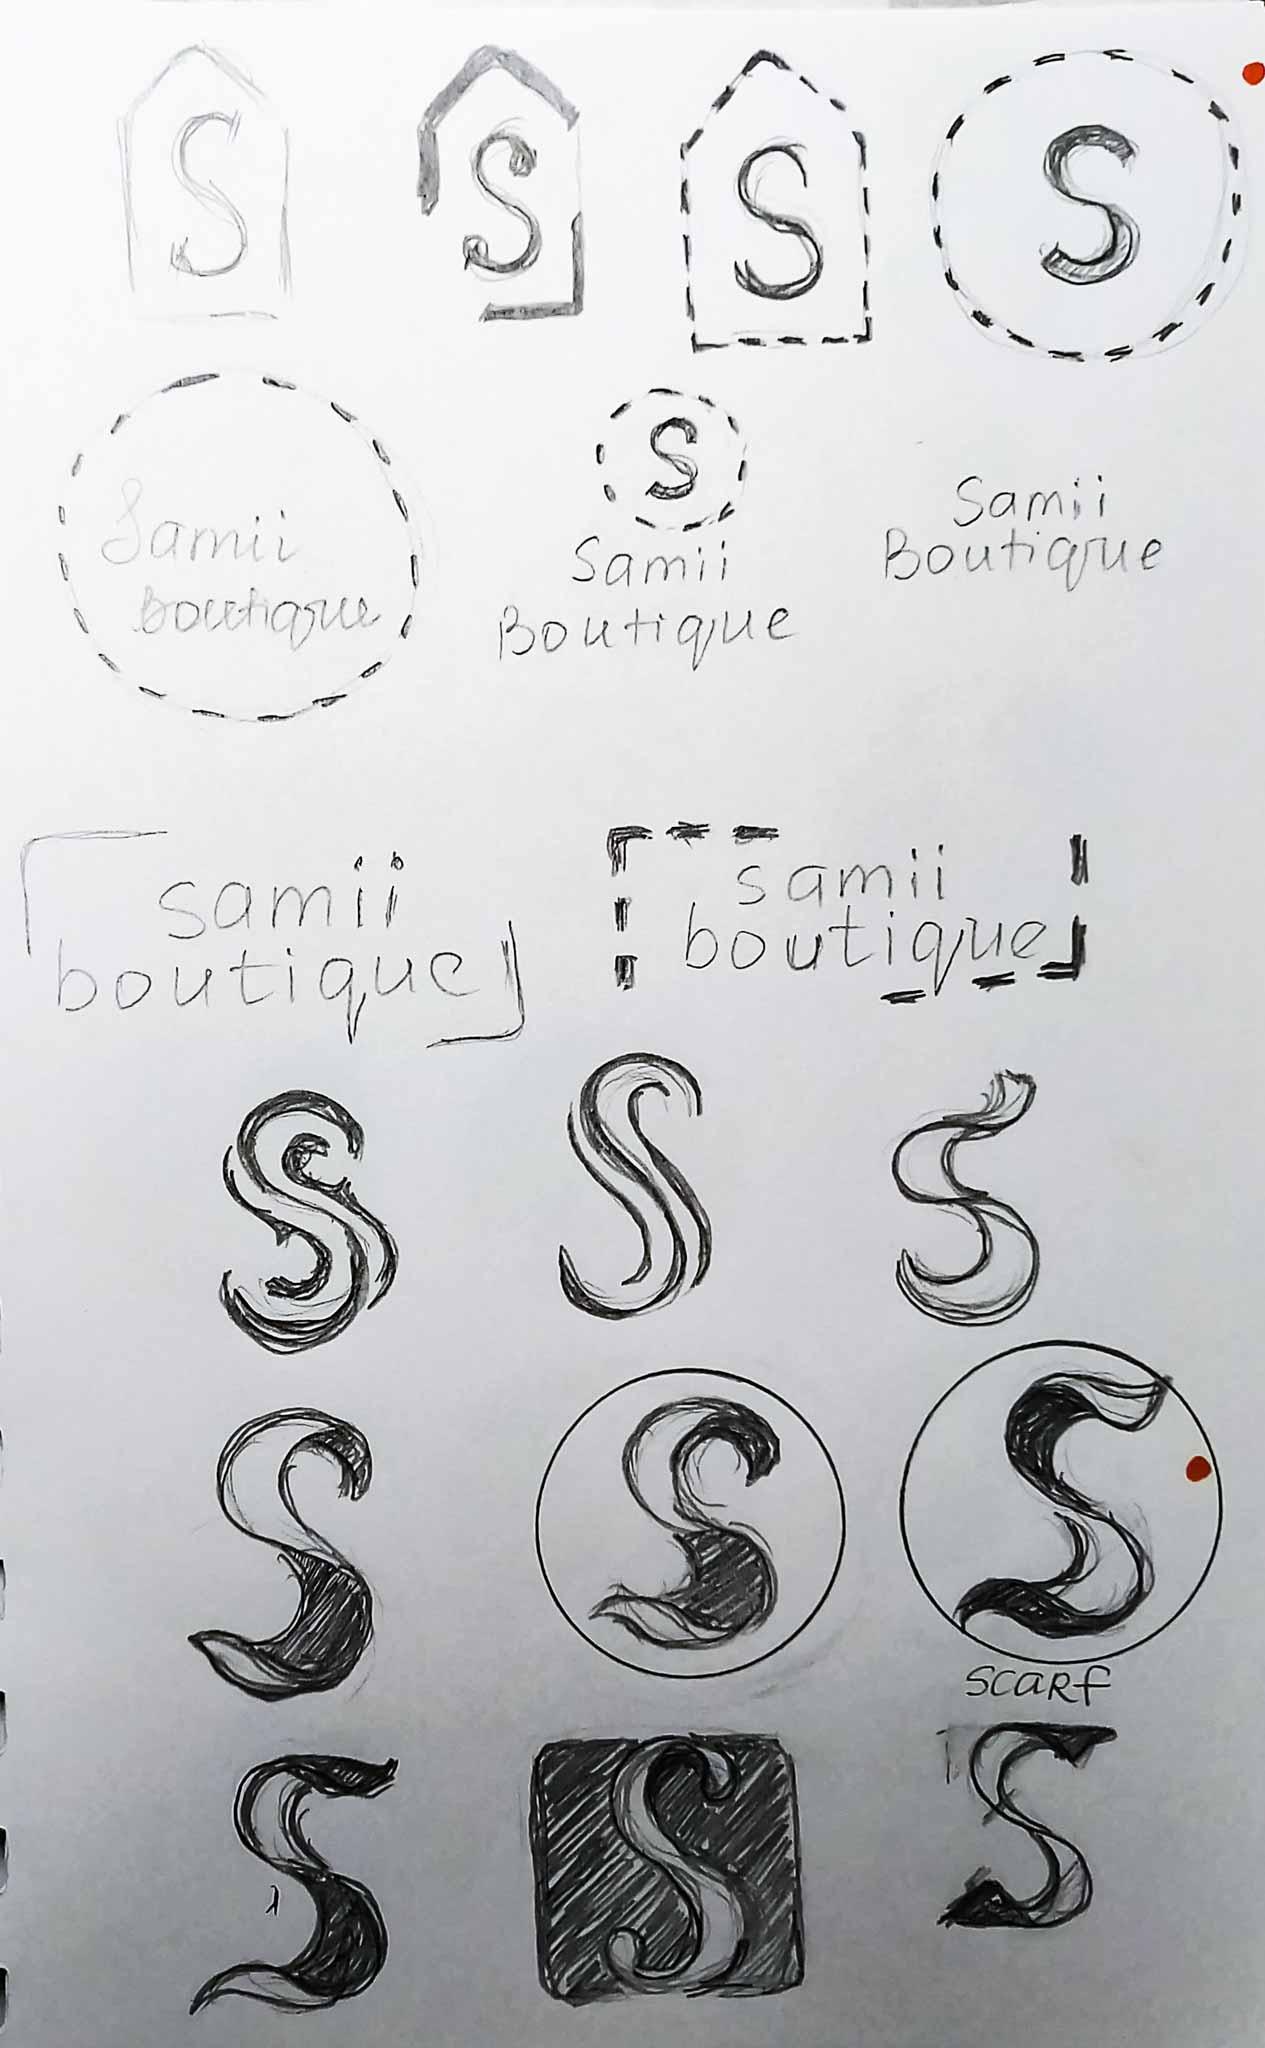 sketch for a boutique logo design